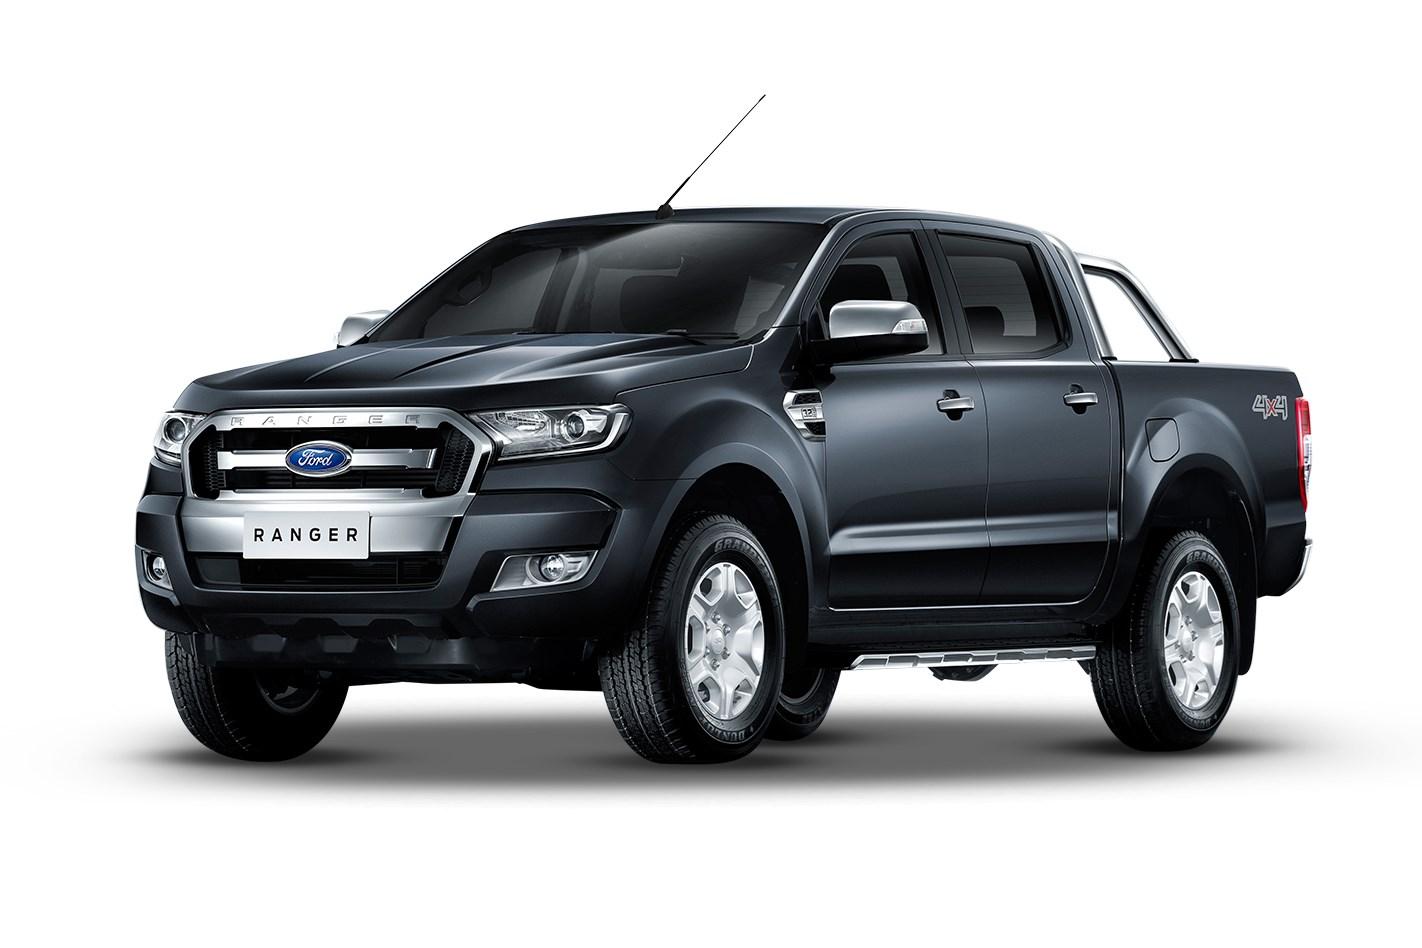 2017 ford ranger xlt 3 2 4x4 3 2l 5cyl diesel turbocharged automatic ute